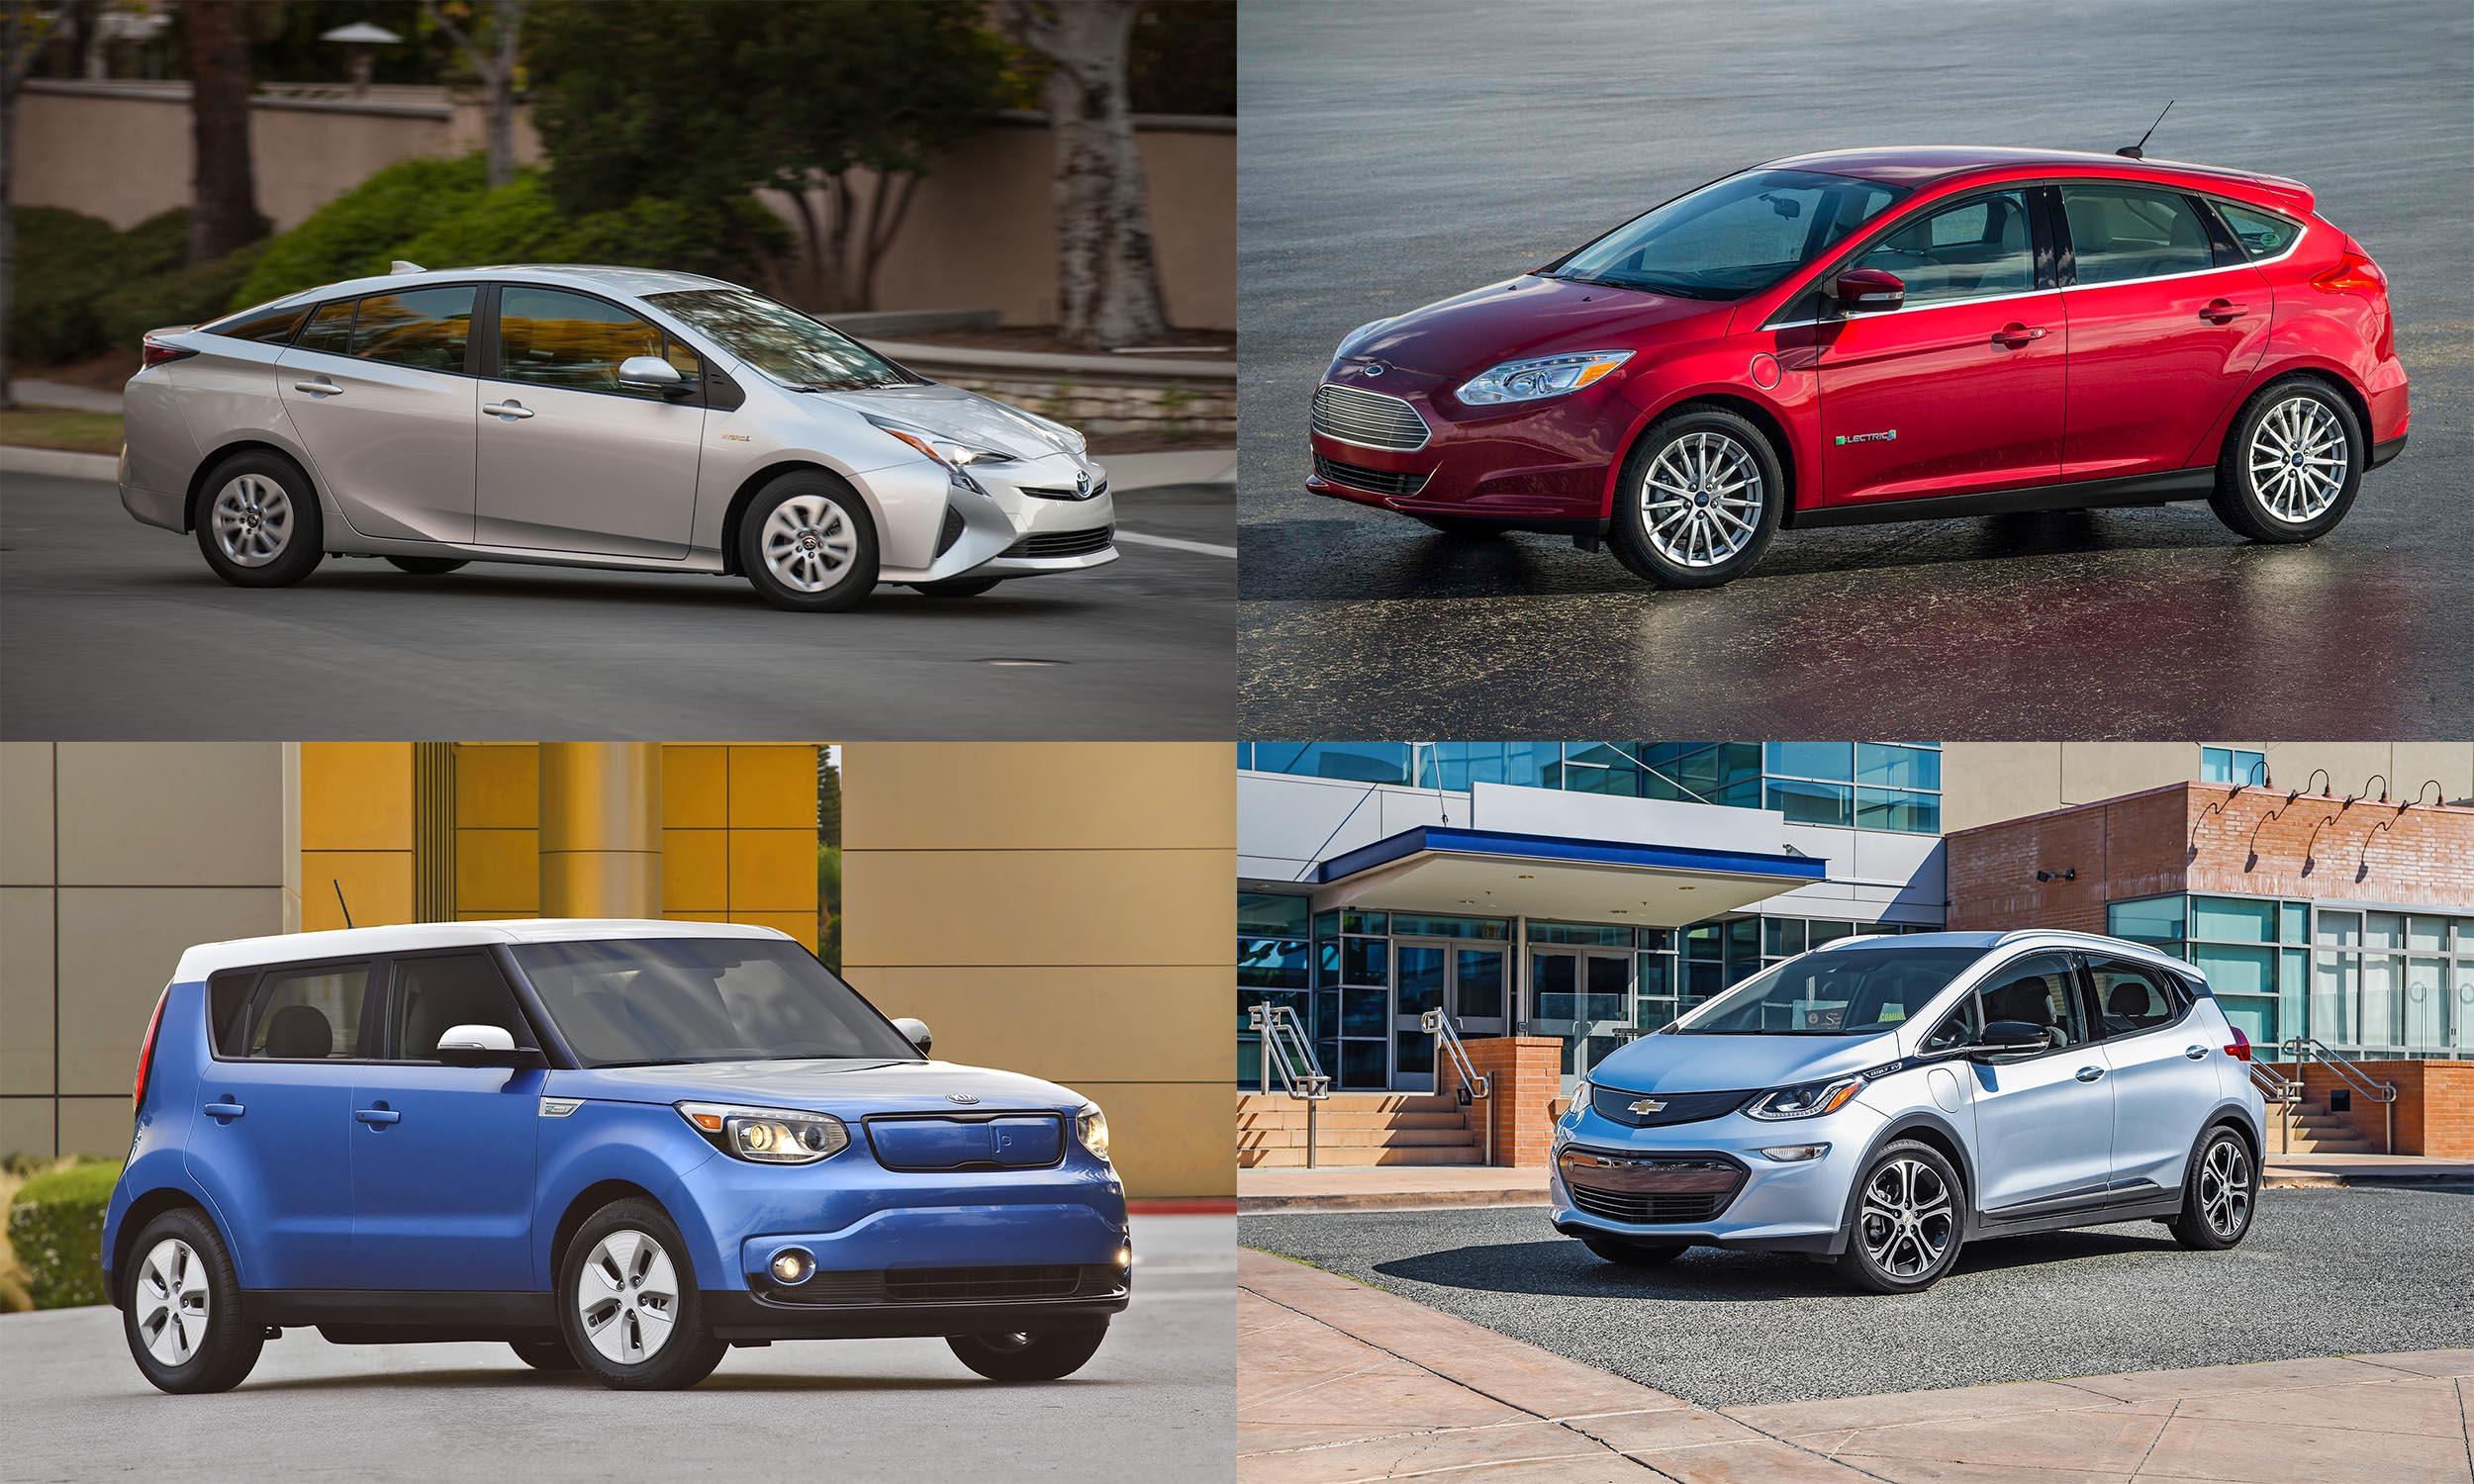 © Toyota Motor Sales, © Kia Motors America, © Ford Motor Company, © BMW USA